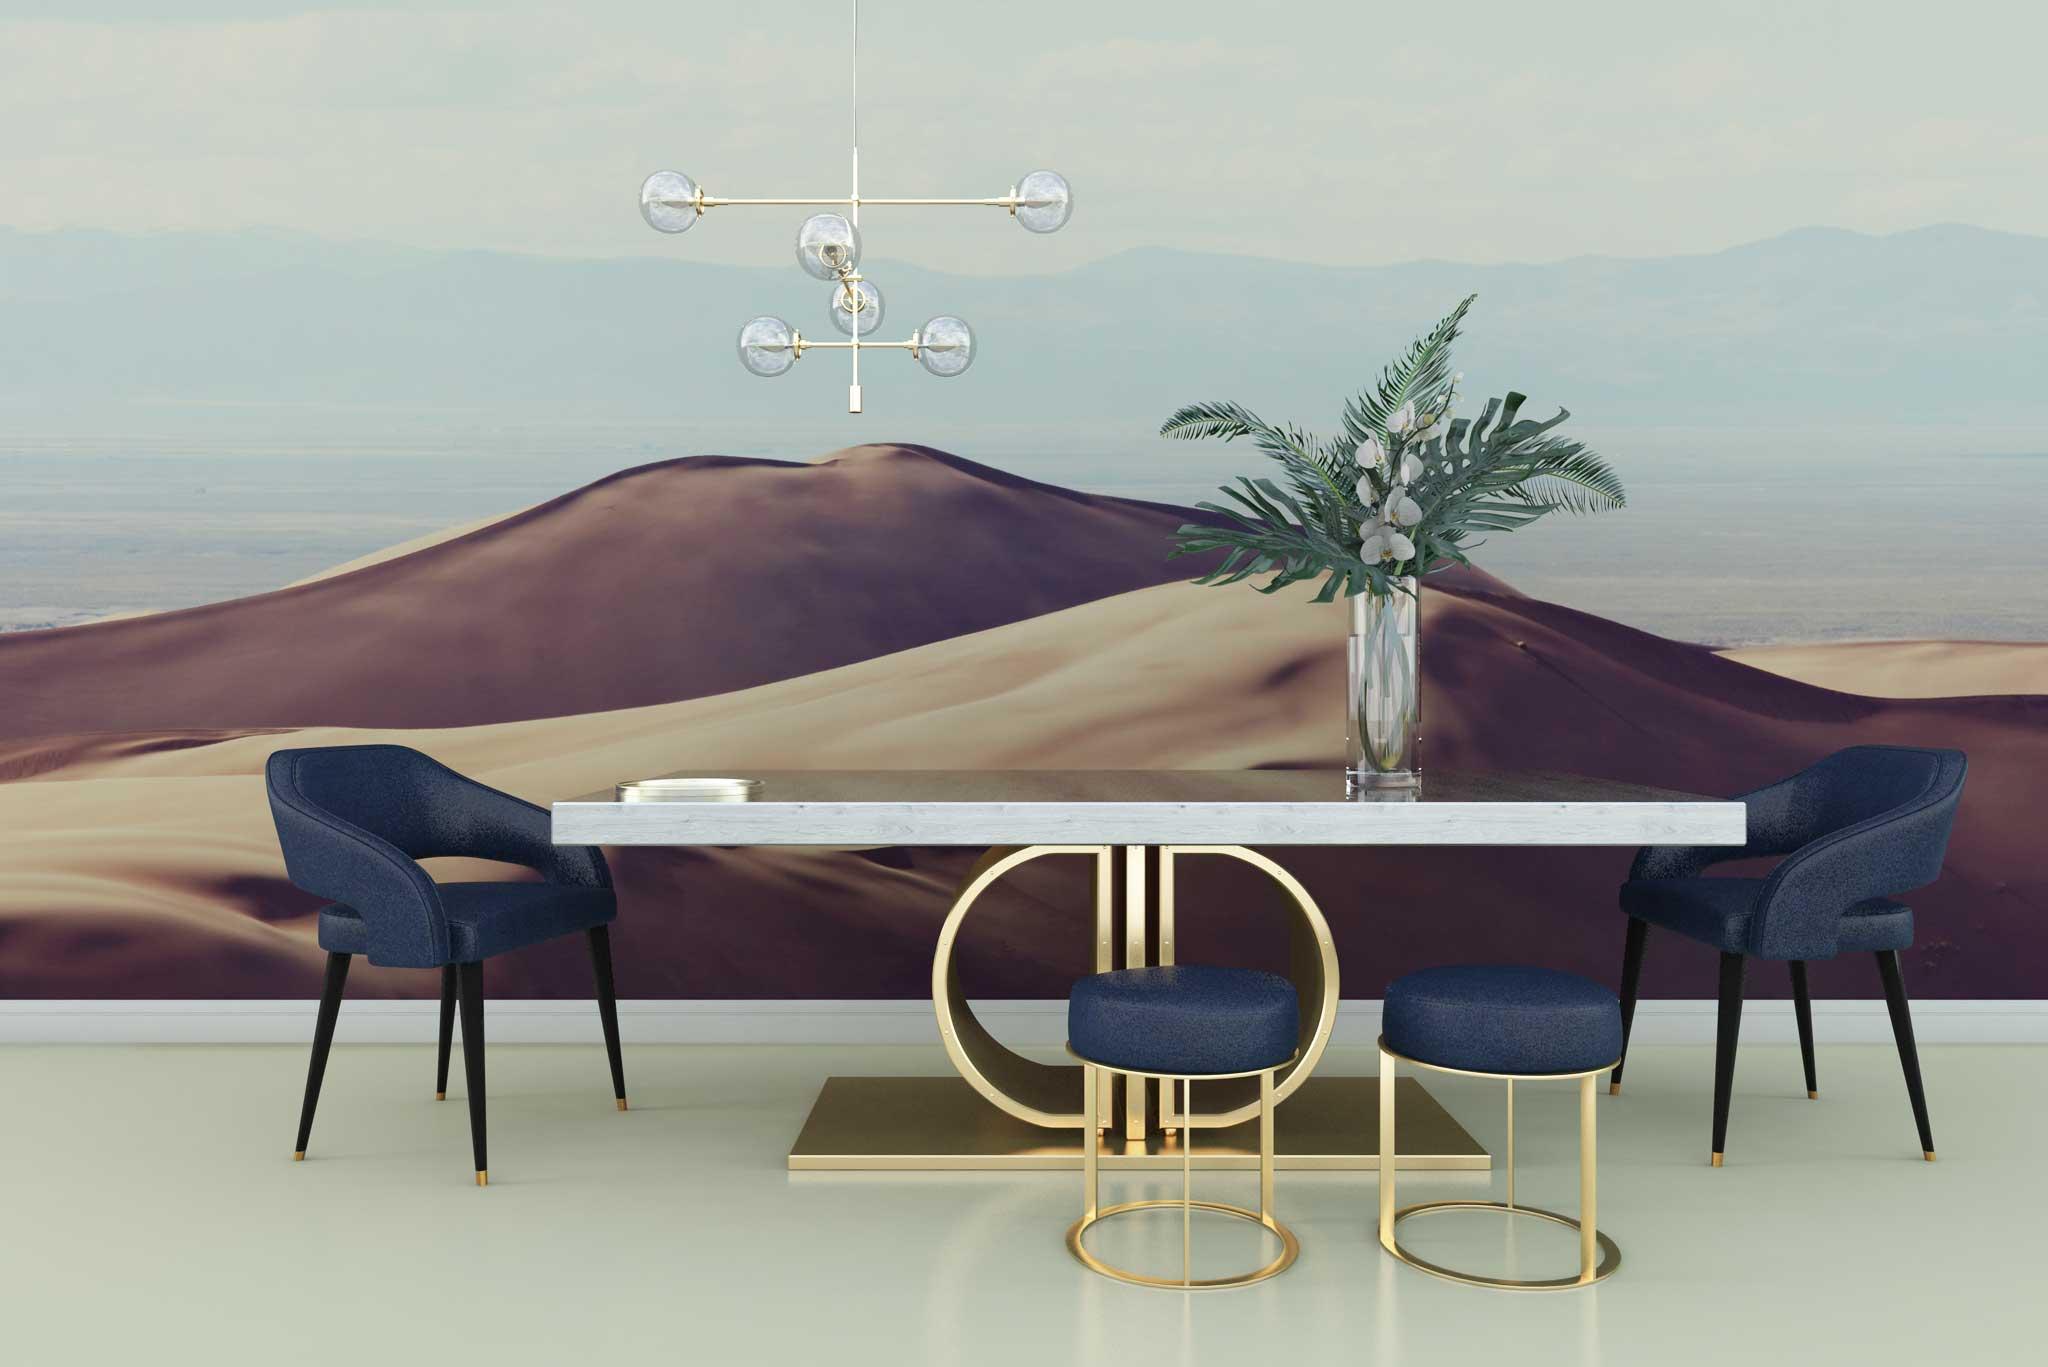 tapet-fototapet-personalizat-comanda-bucuresti-model-fotografie-dune-nisip-desert-perete-lux-special